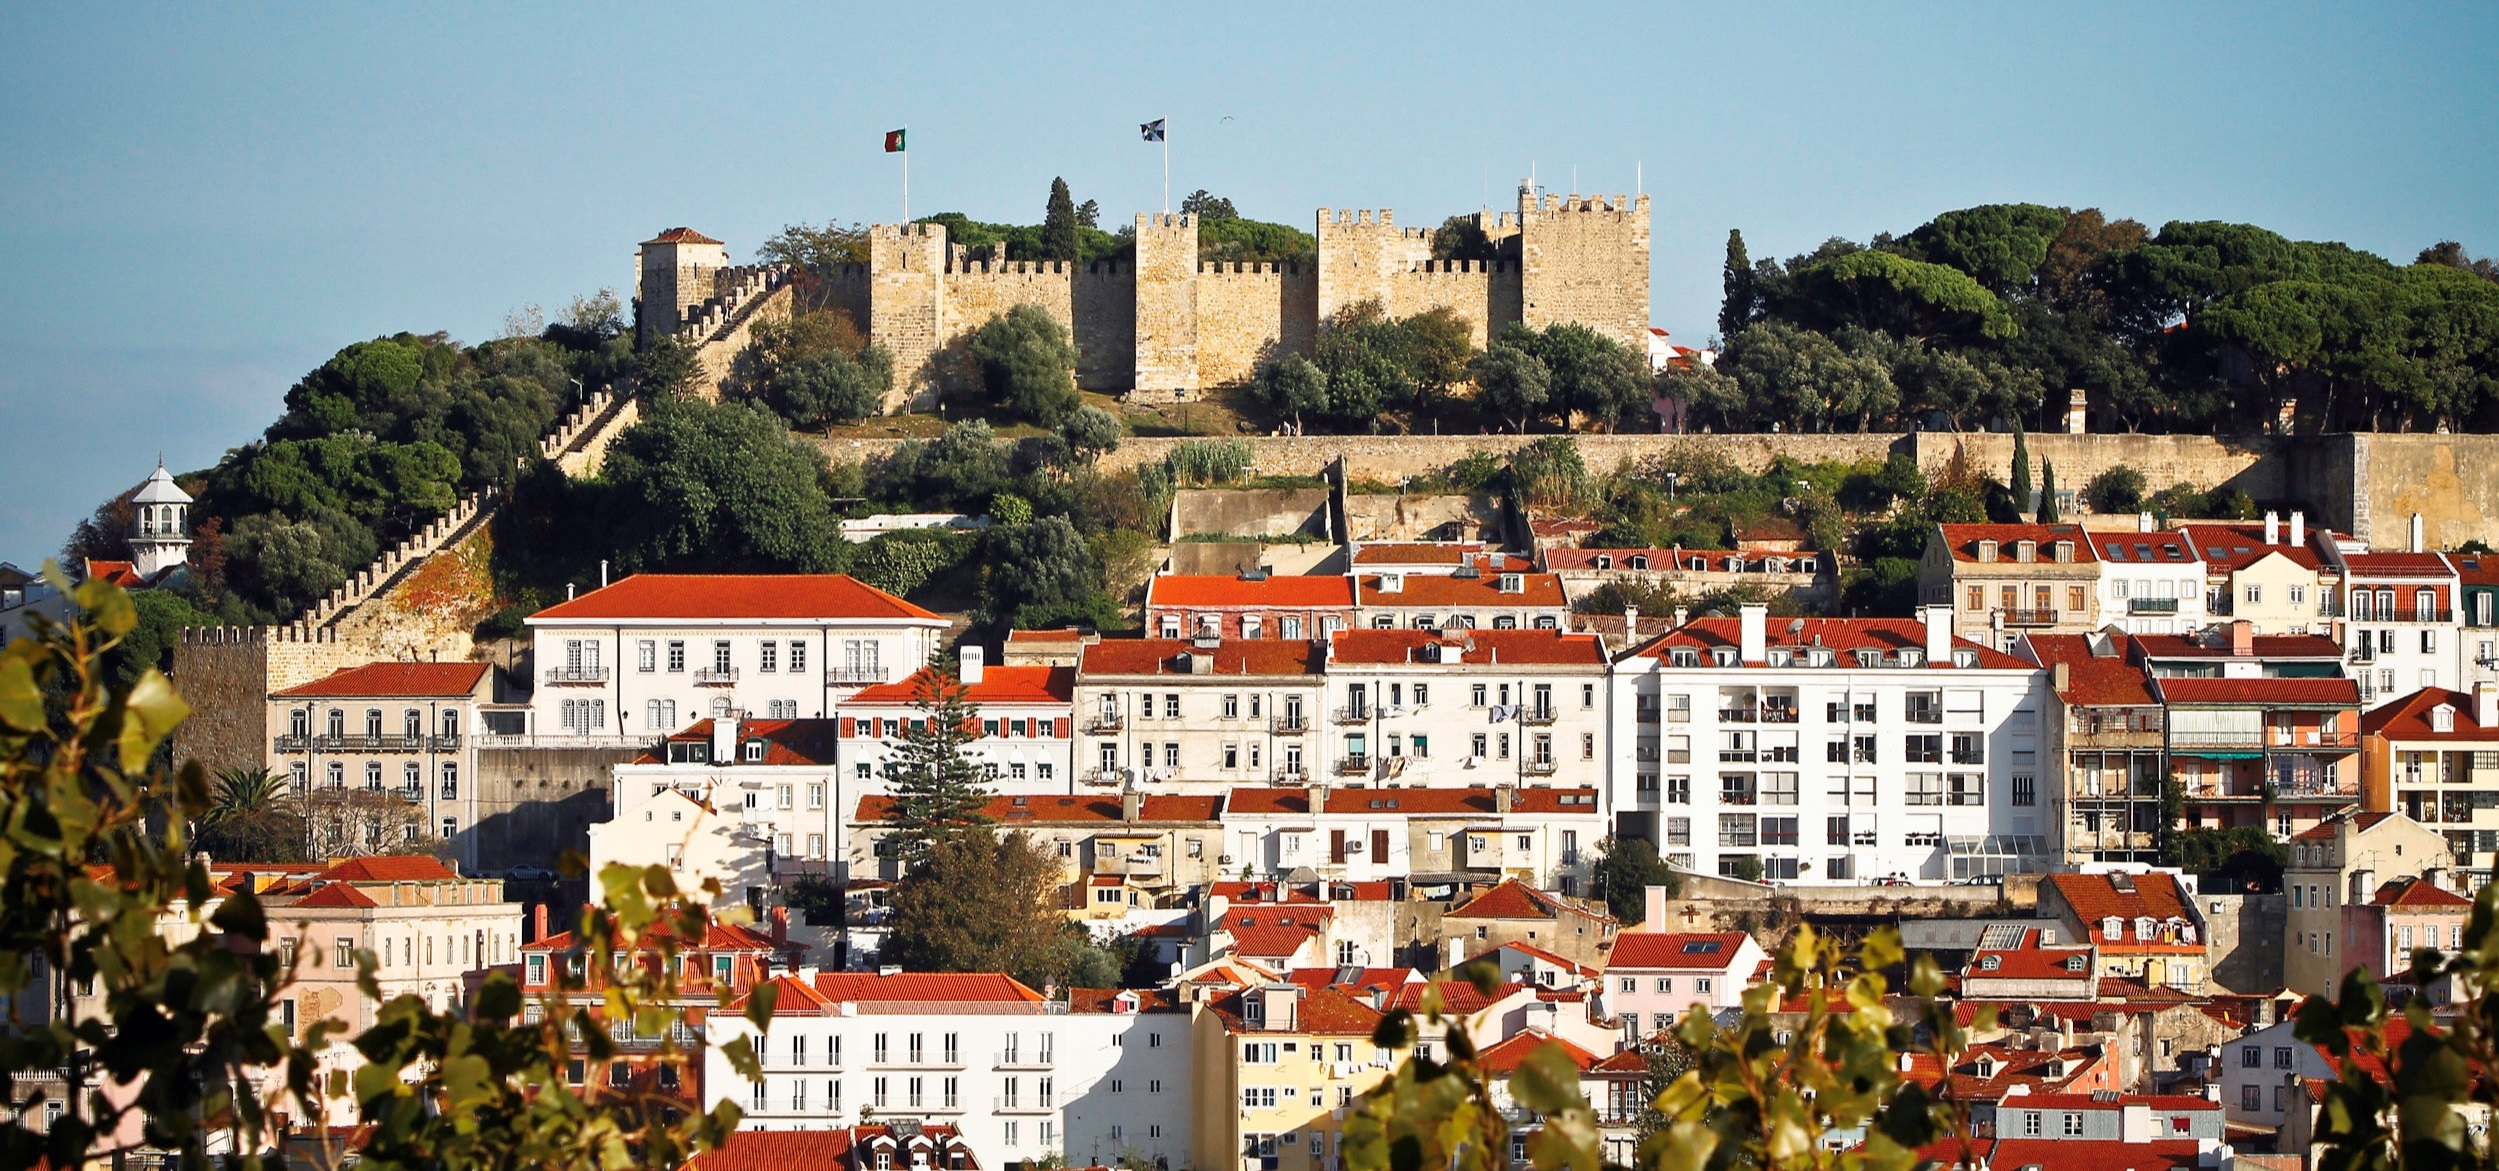 CastleSJorge_ac_01_Credit Turismo Lisboa.jpg